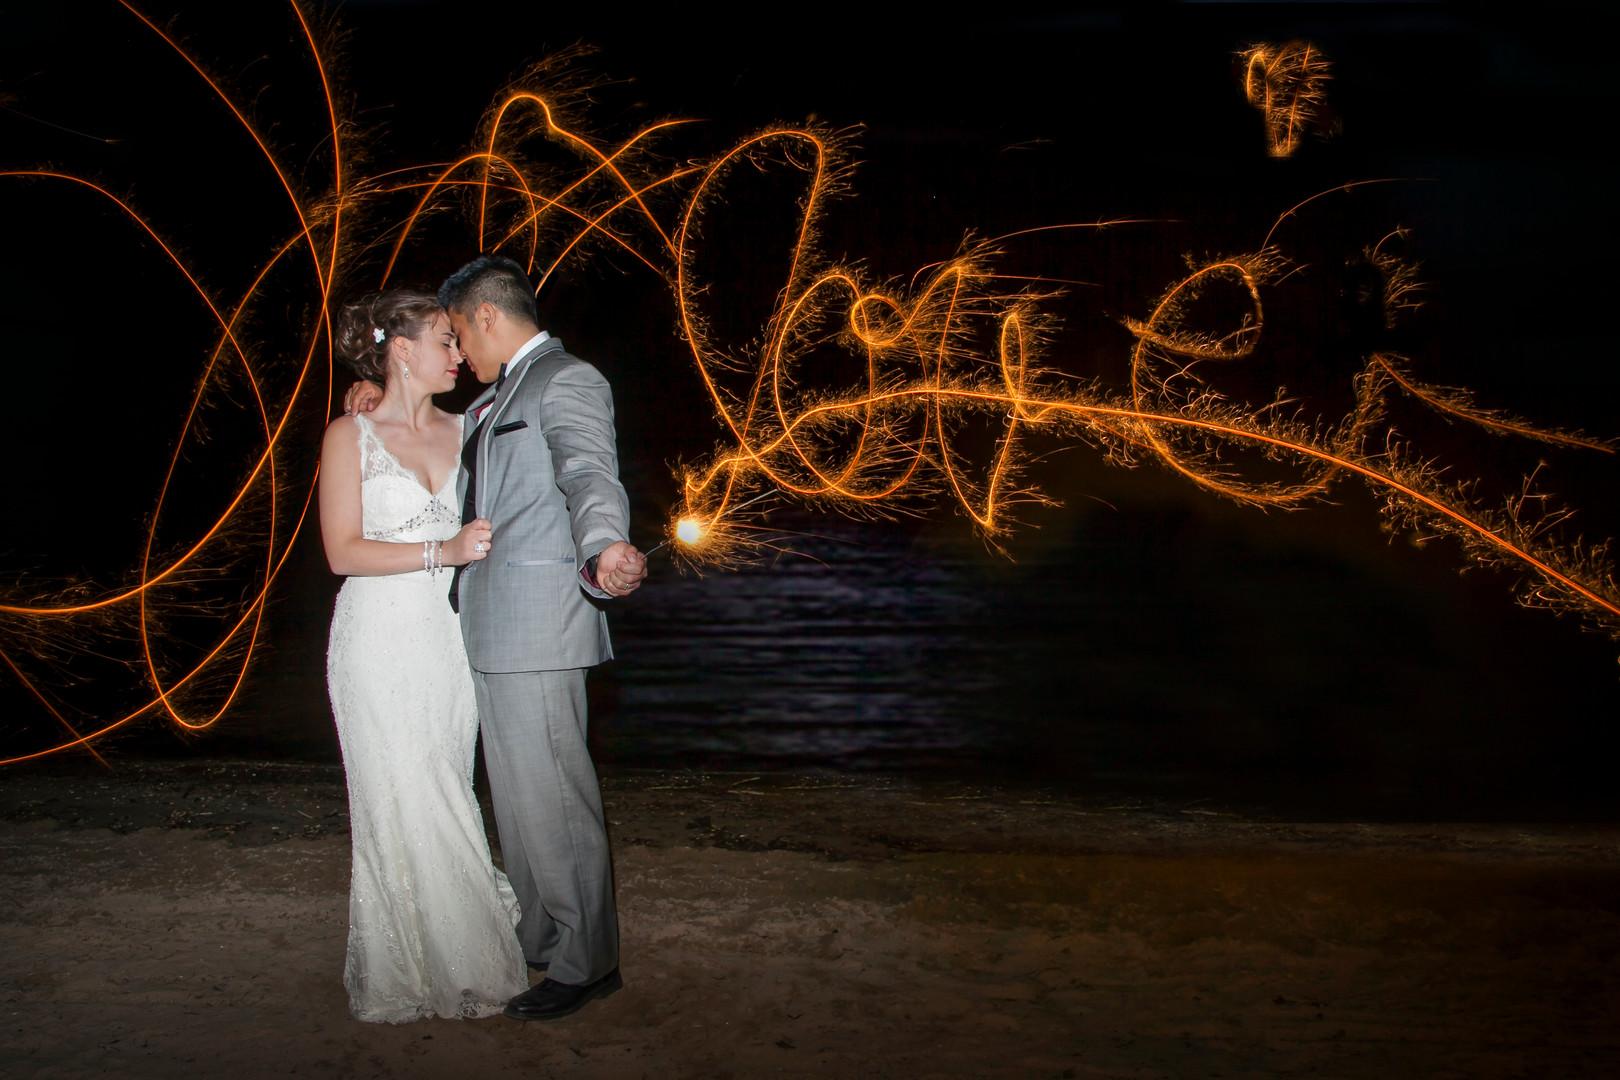 sparkler wedding photography